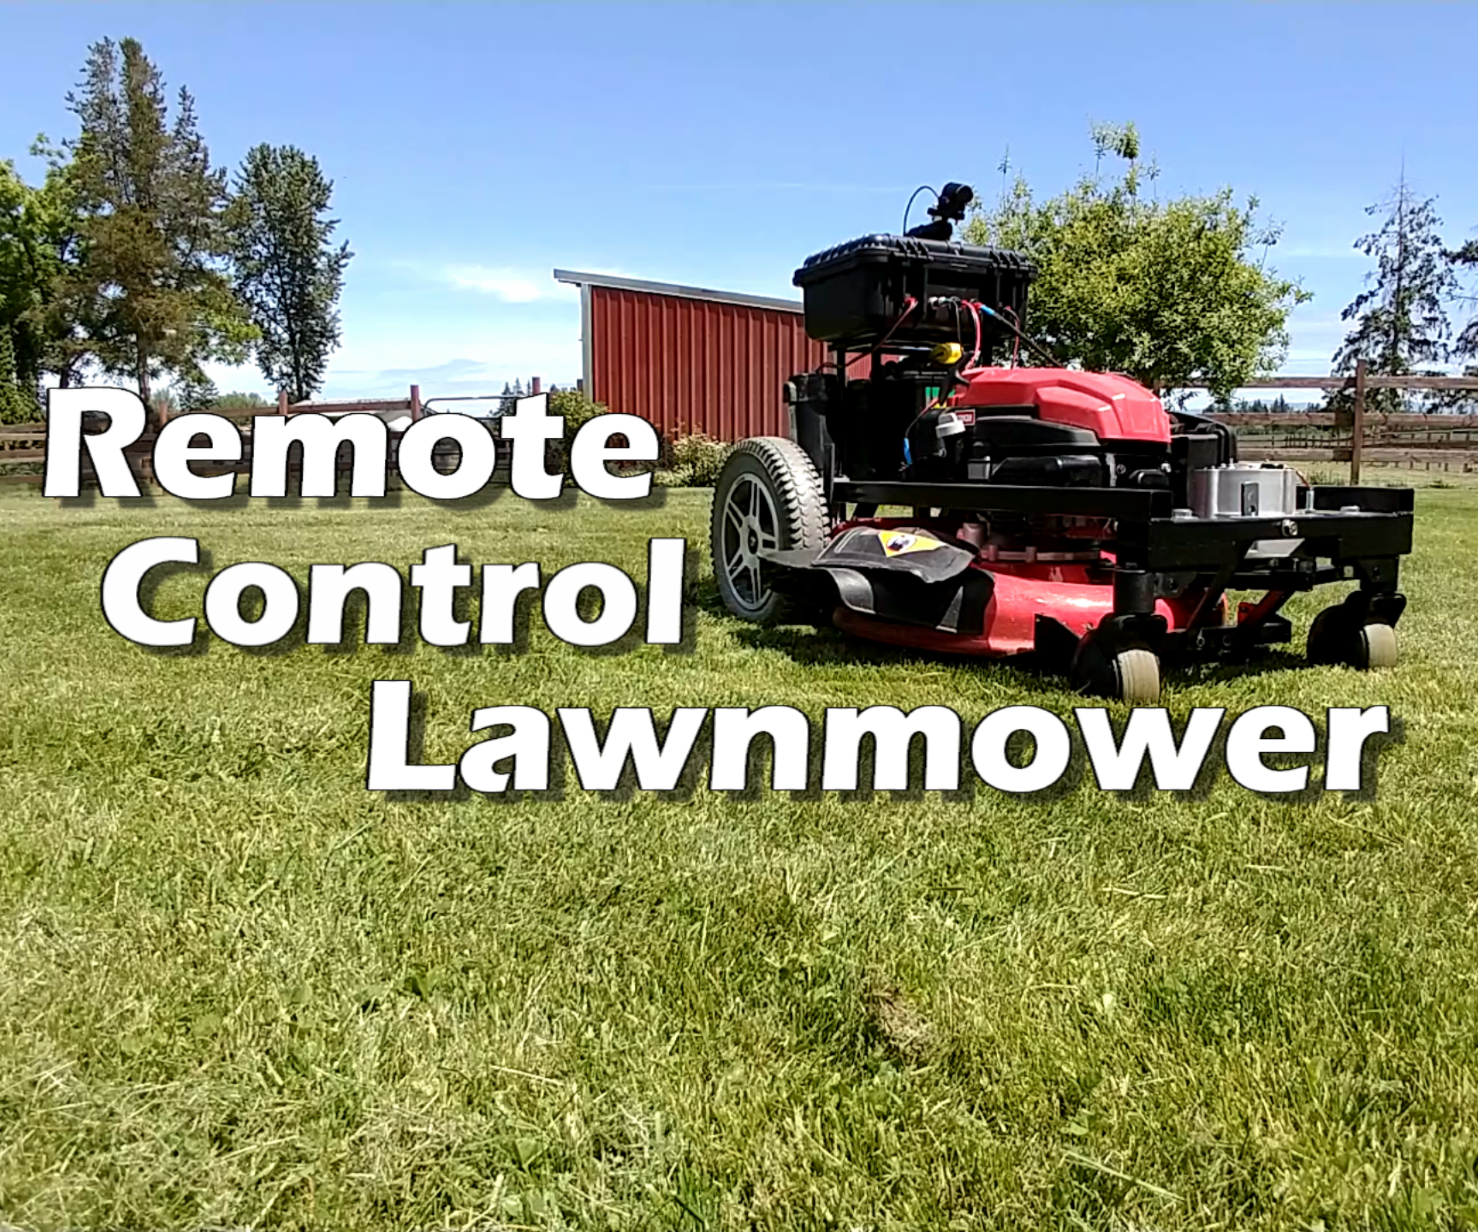 Remote Control Lawn Mower